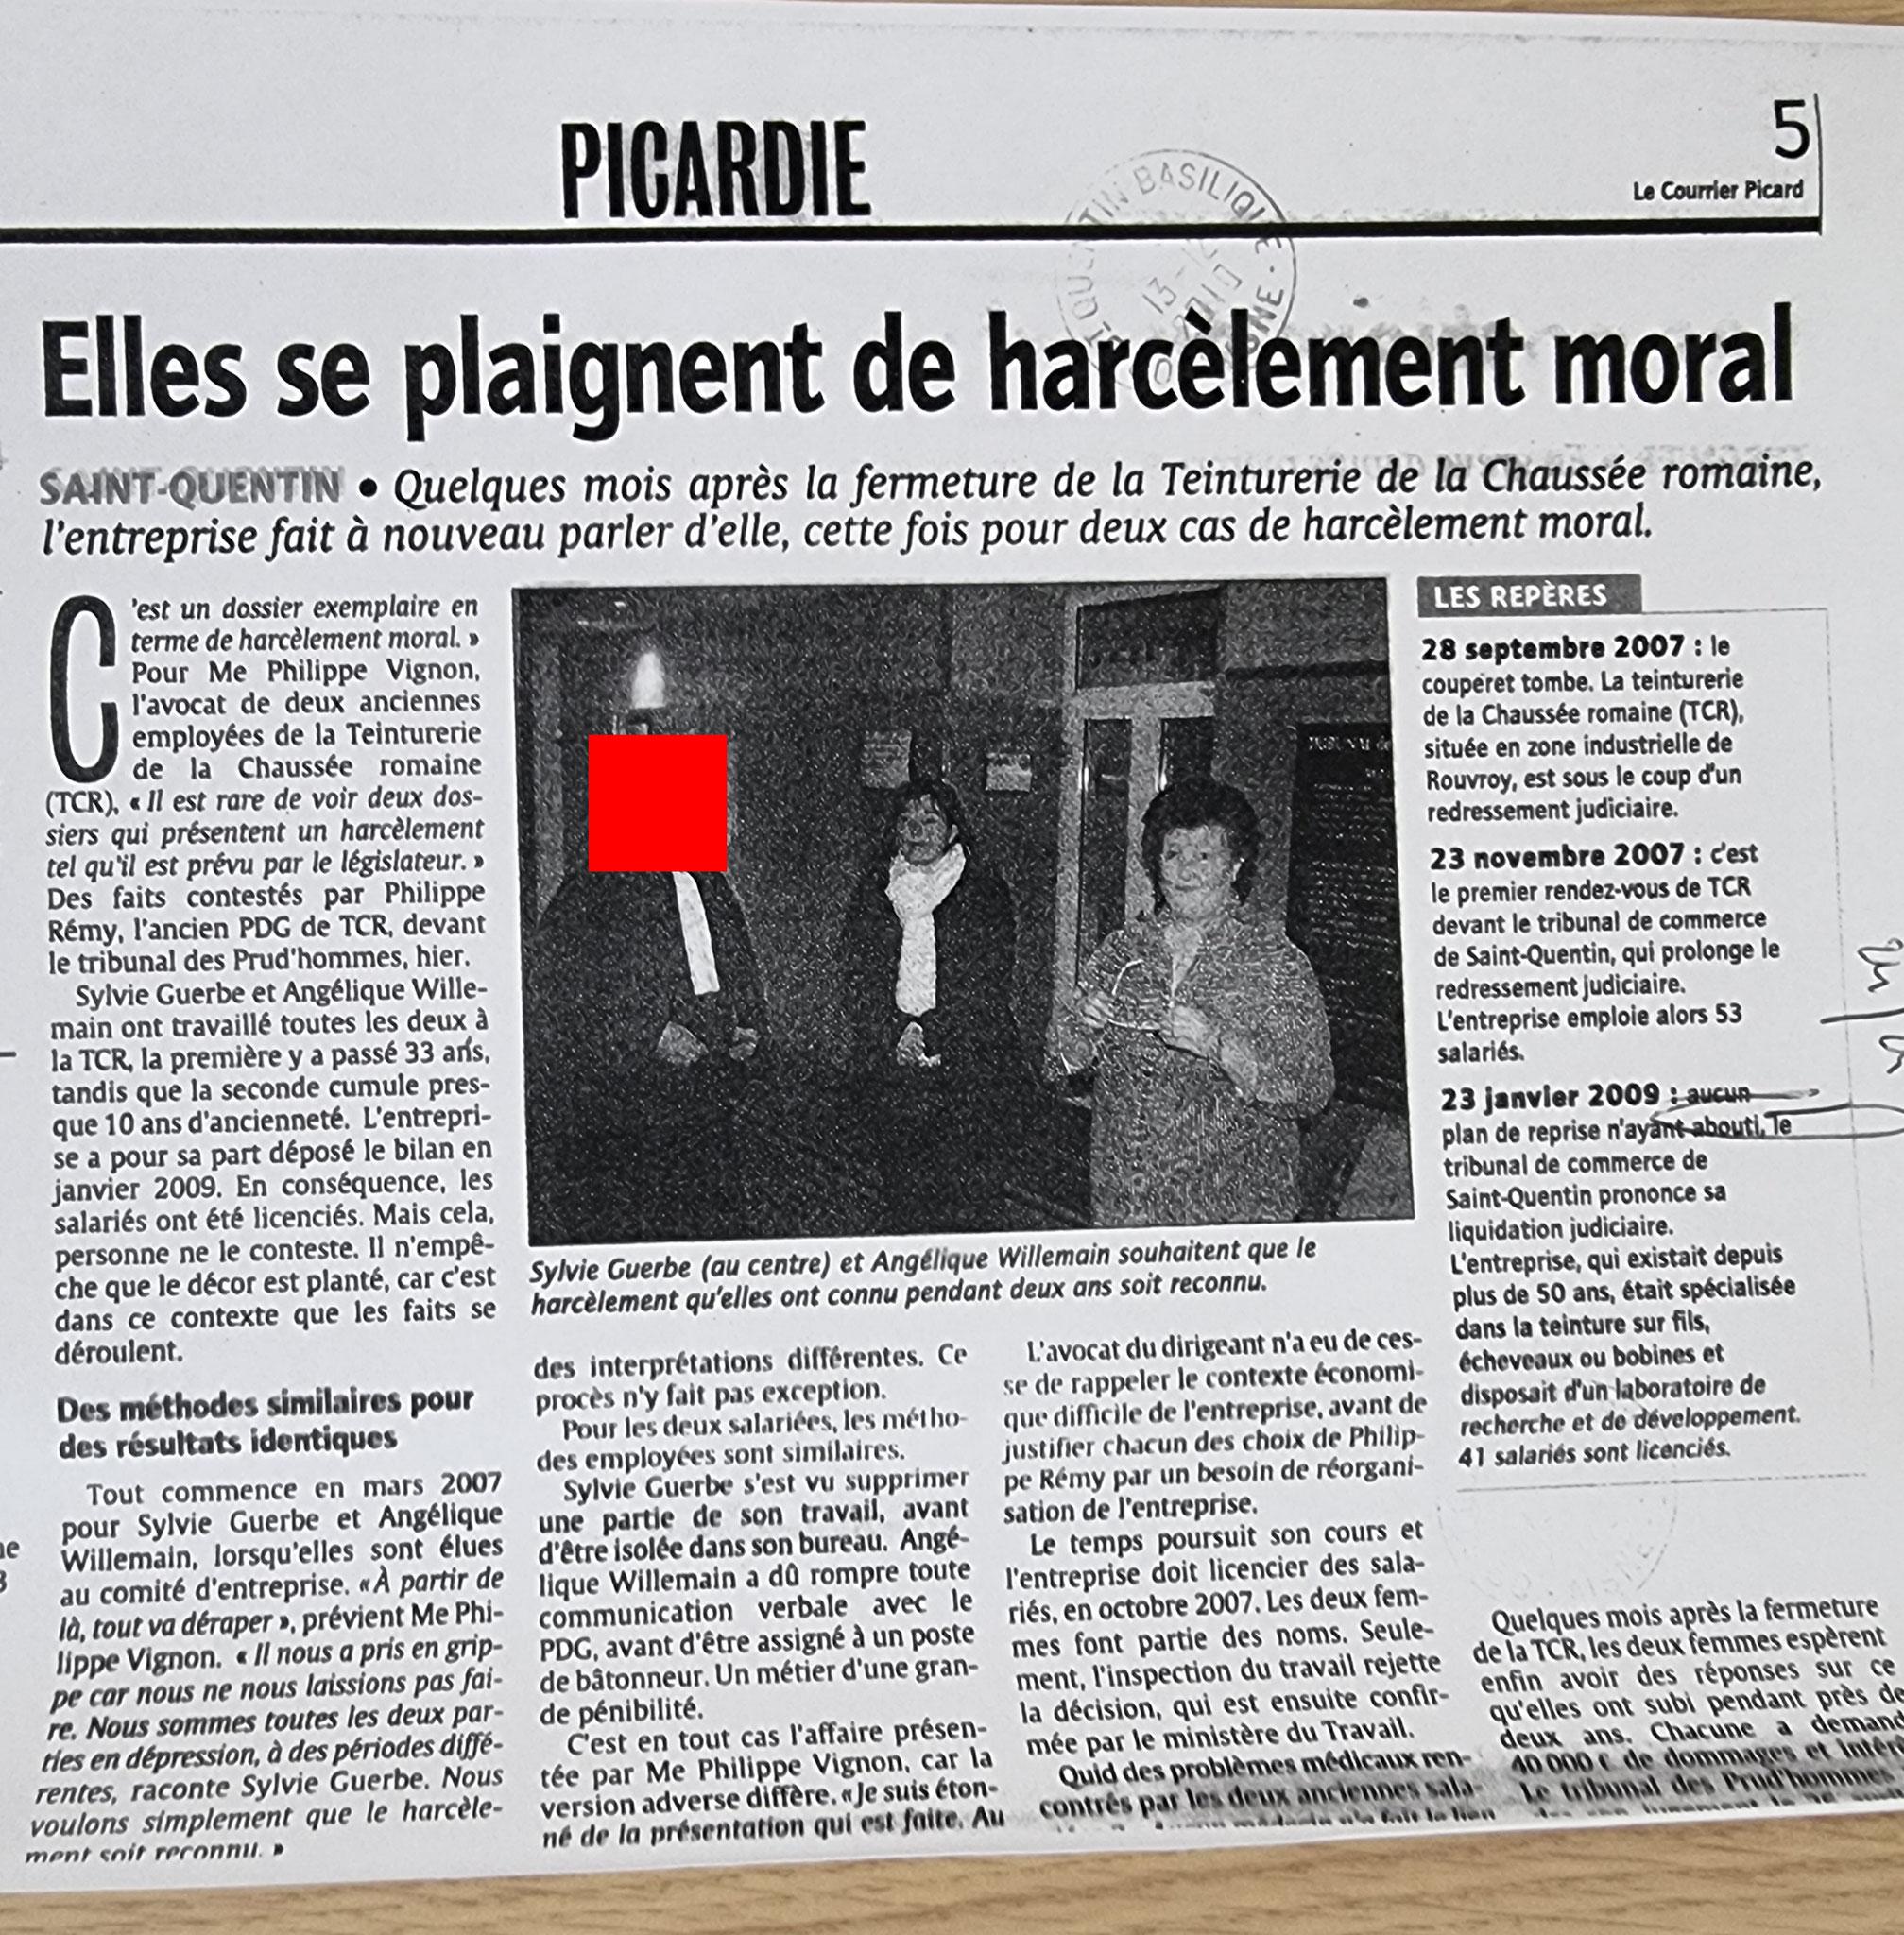 Le 01 décembre 2009 j'adresse une LRAR au THERMICIEN  www.jenesuispasunchien.fr www.jesuisvictime.fr www.jesuispatrick.fr